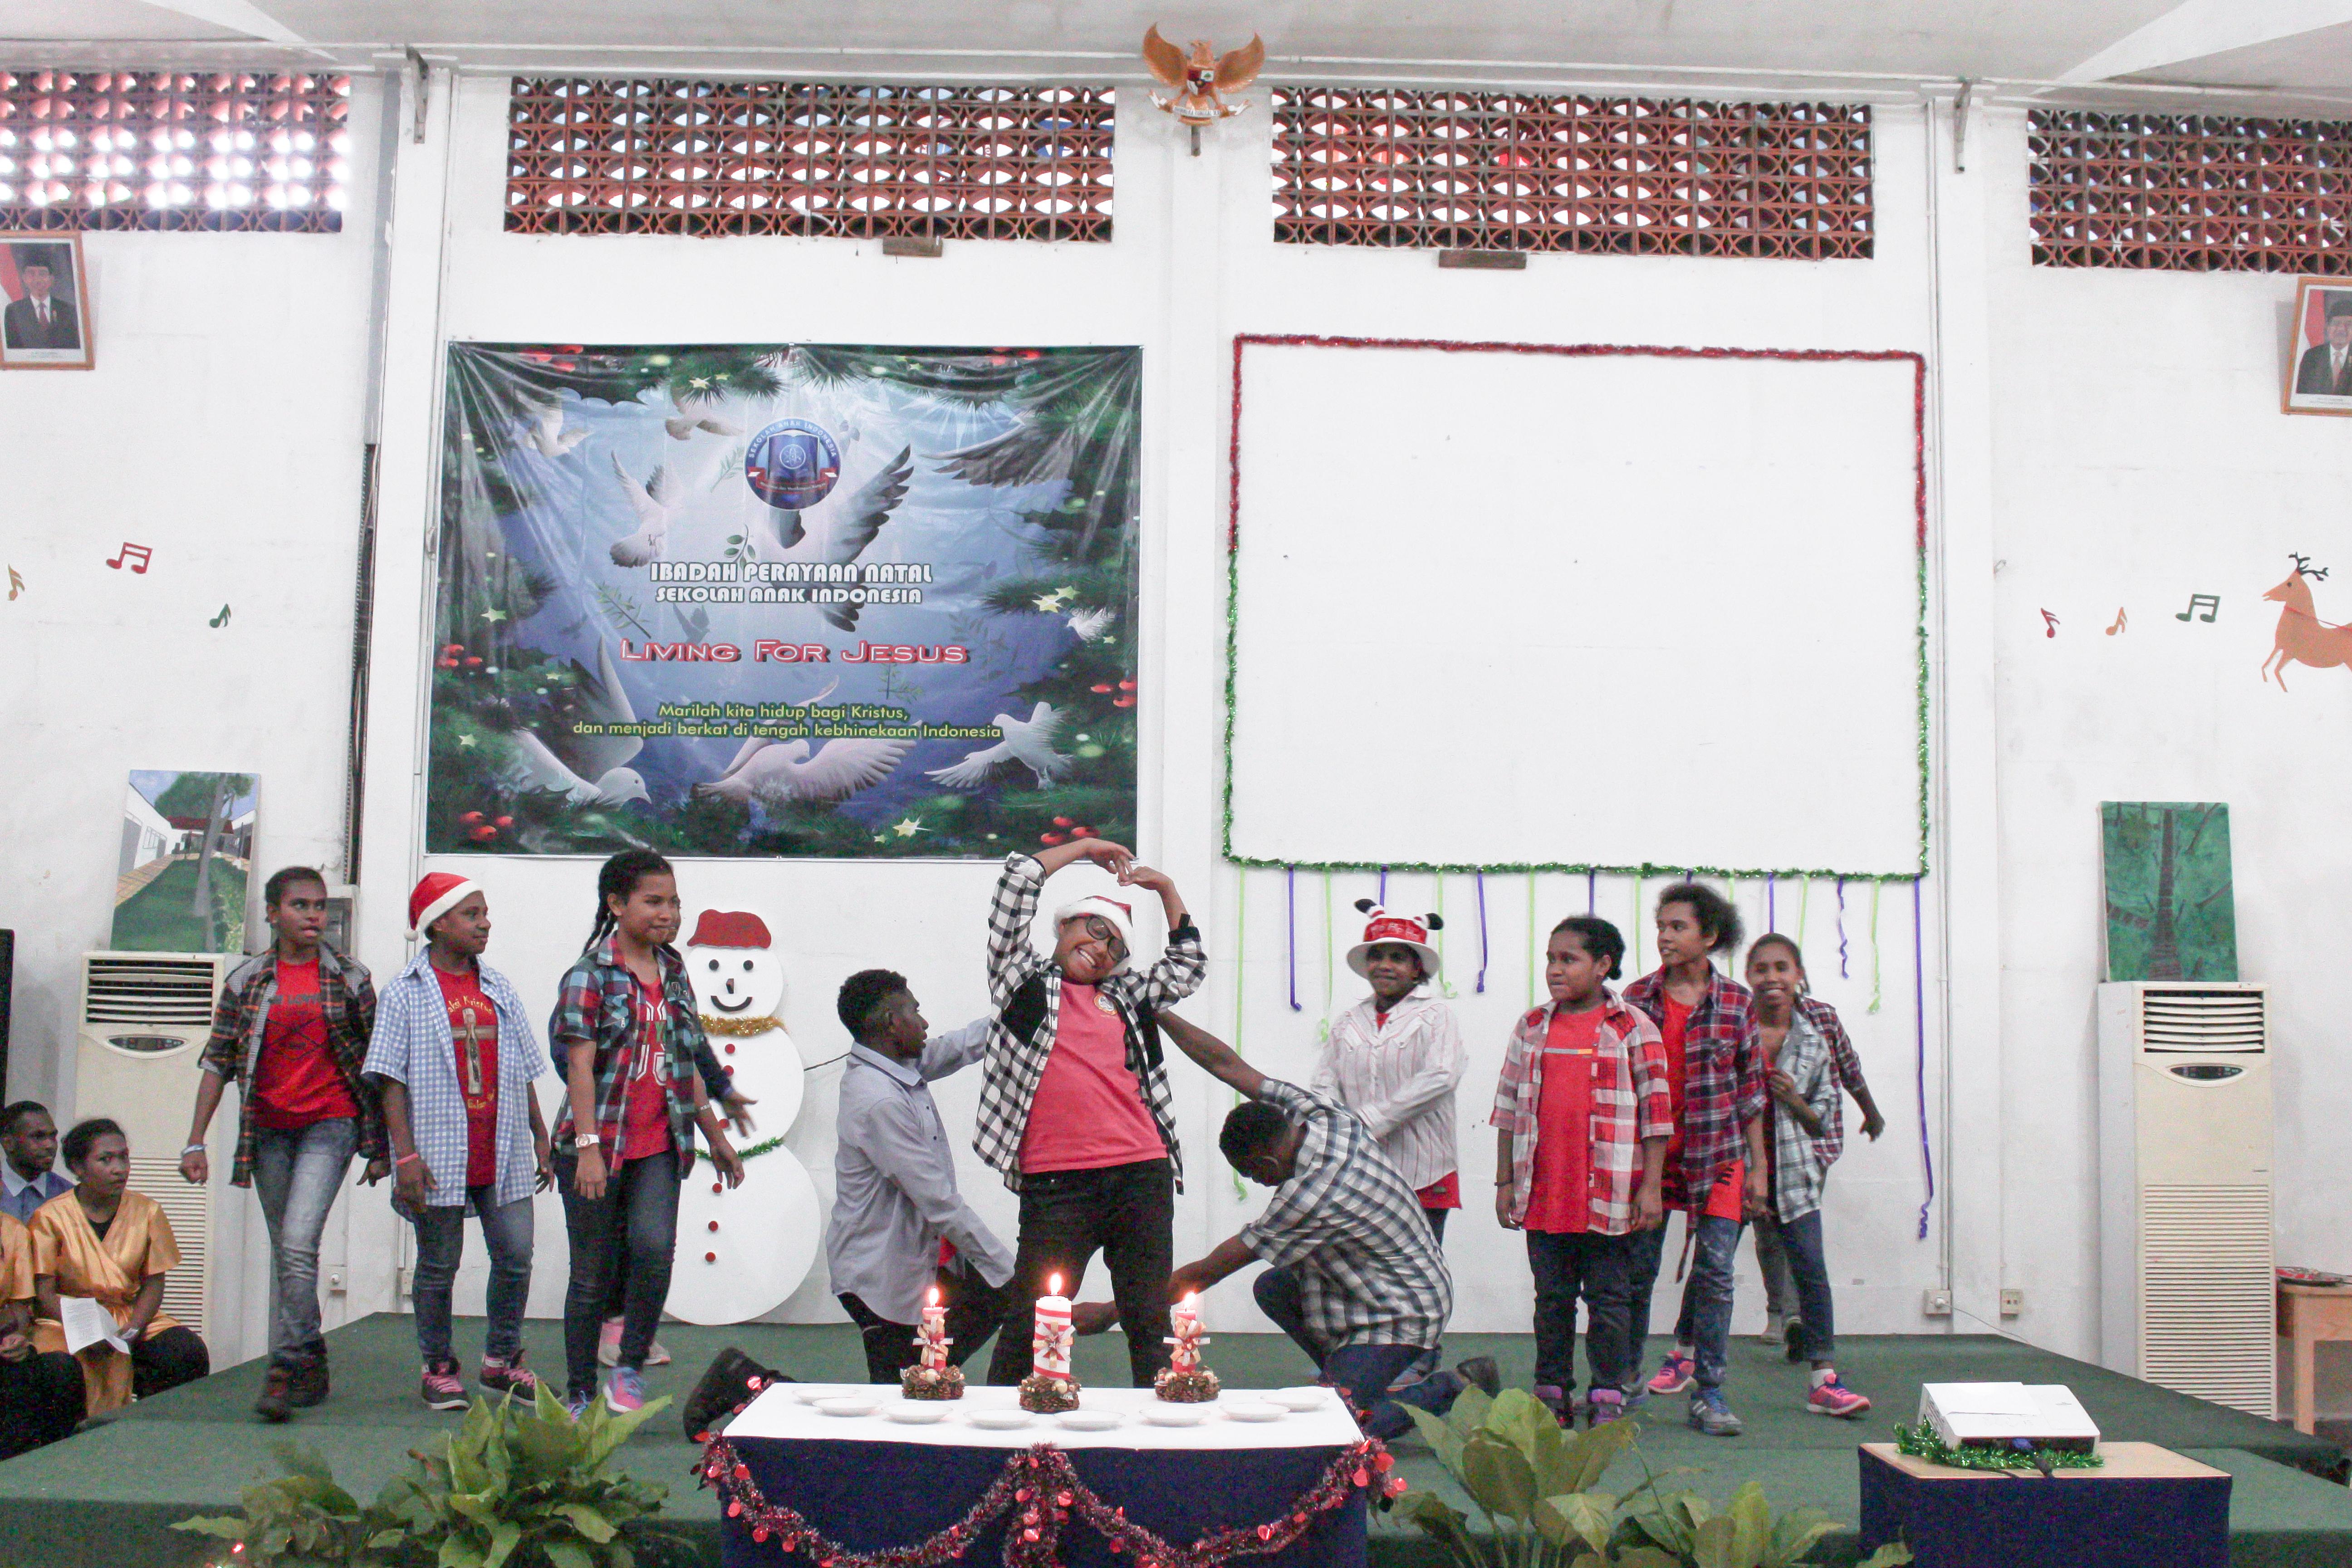 Sekolah anak inodoneia-Natal-sekolah papua-natal 2016-sekolah anak papua